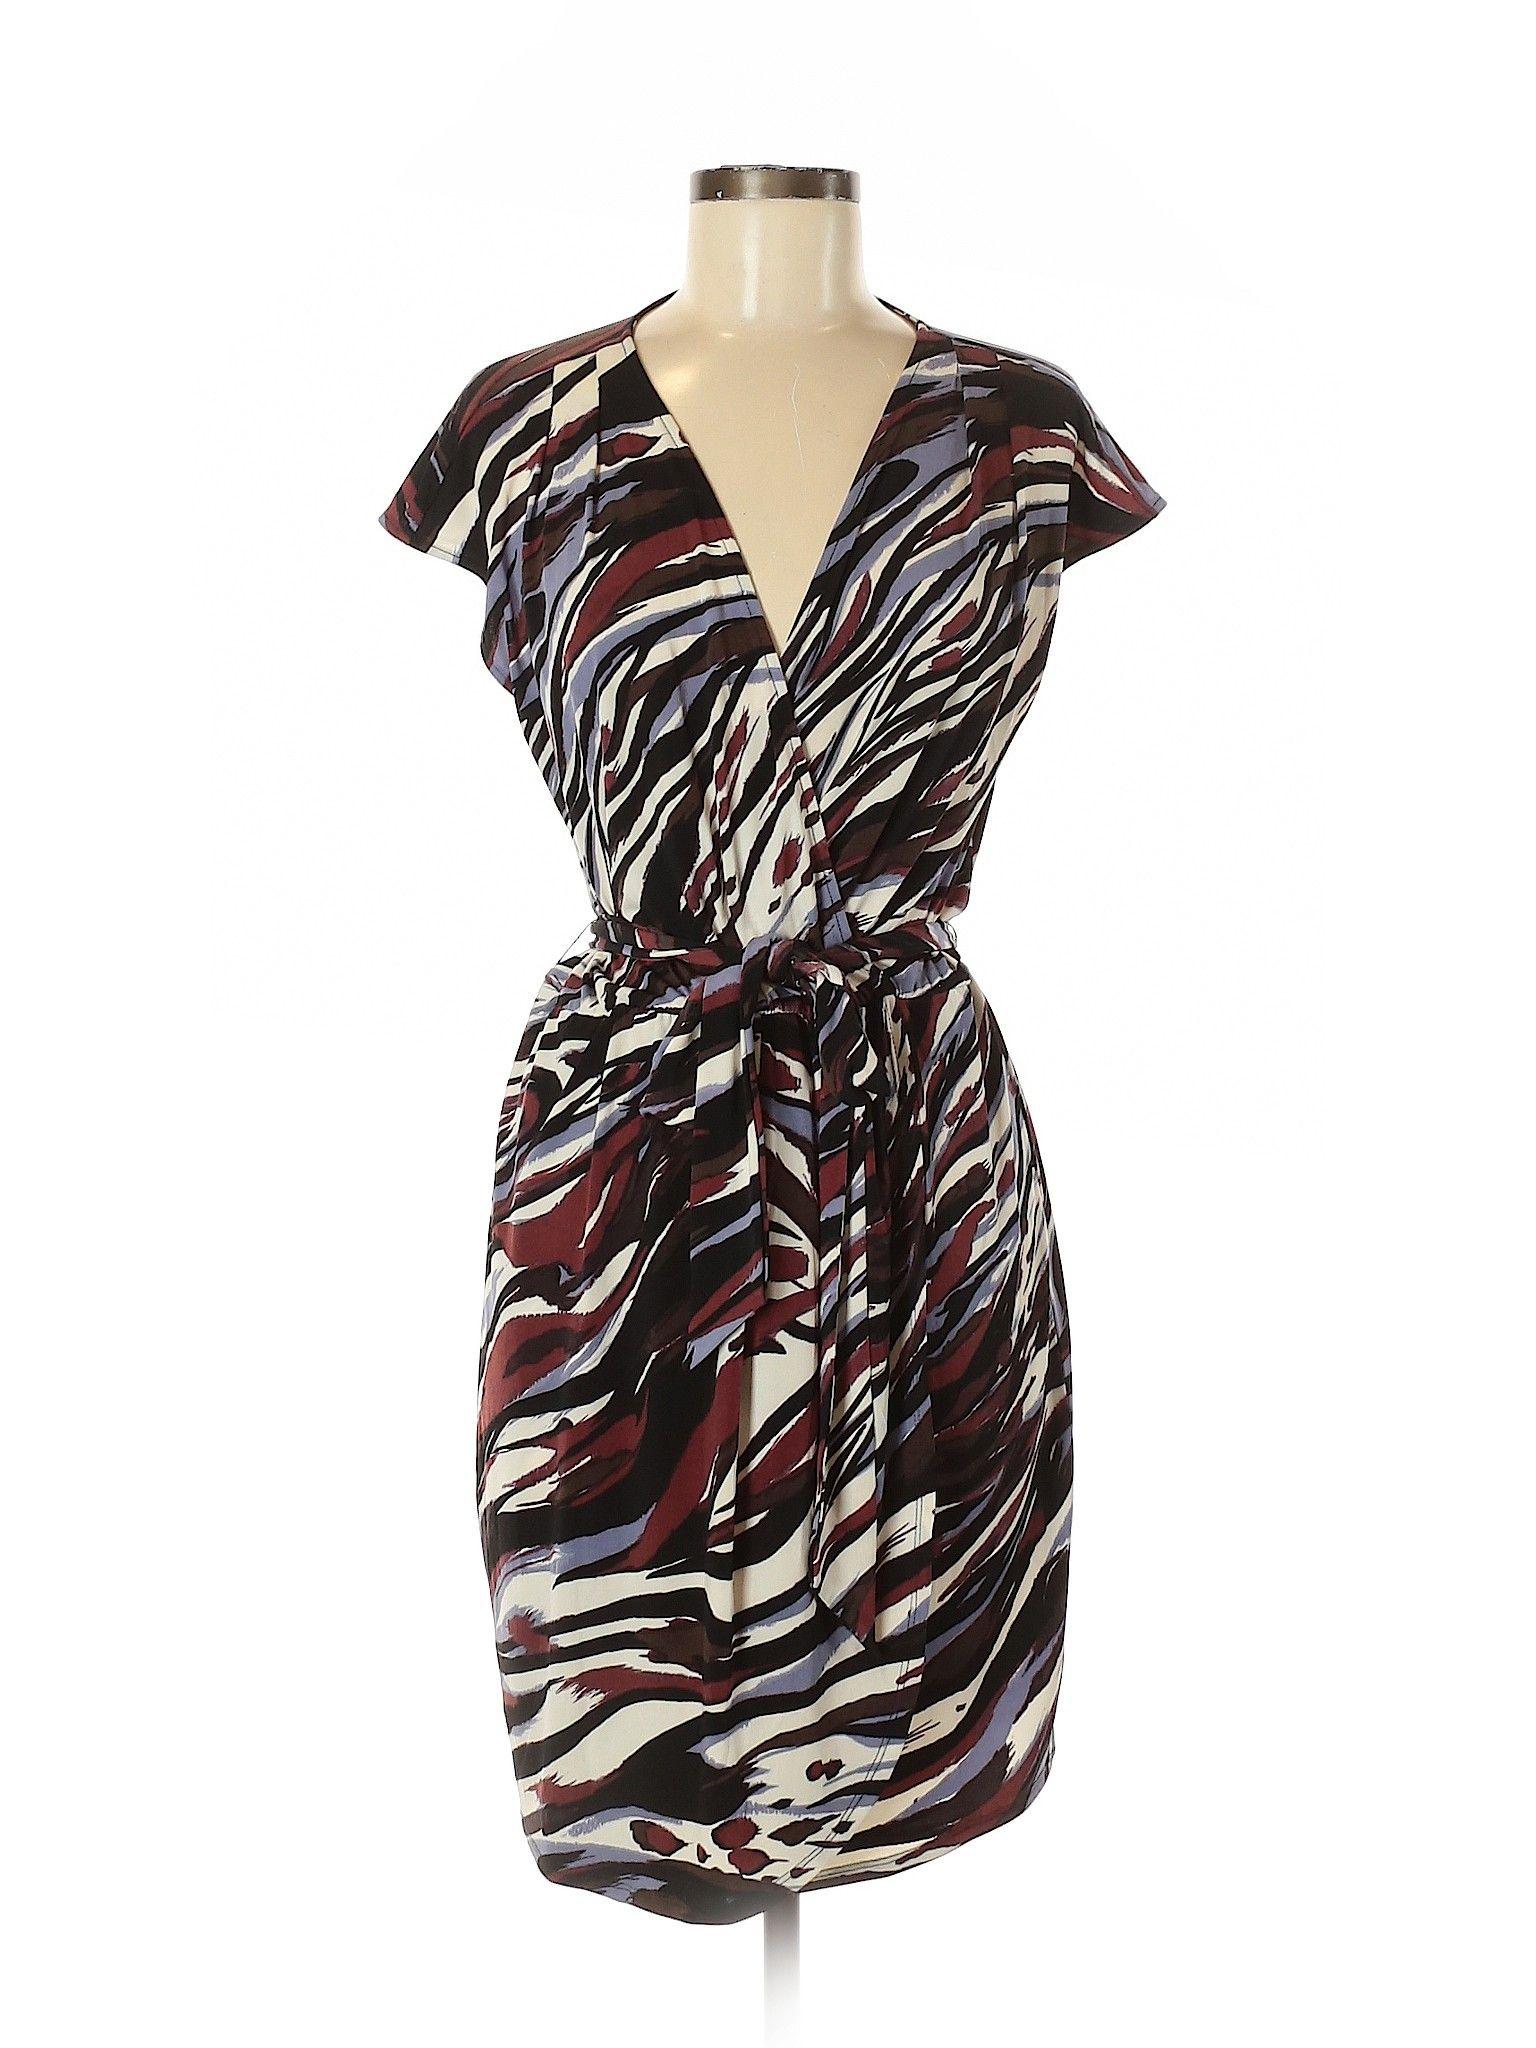 Banana Republic Factory Store Casual Dress Sheath Brown